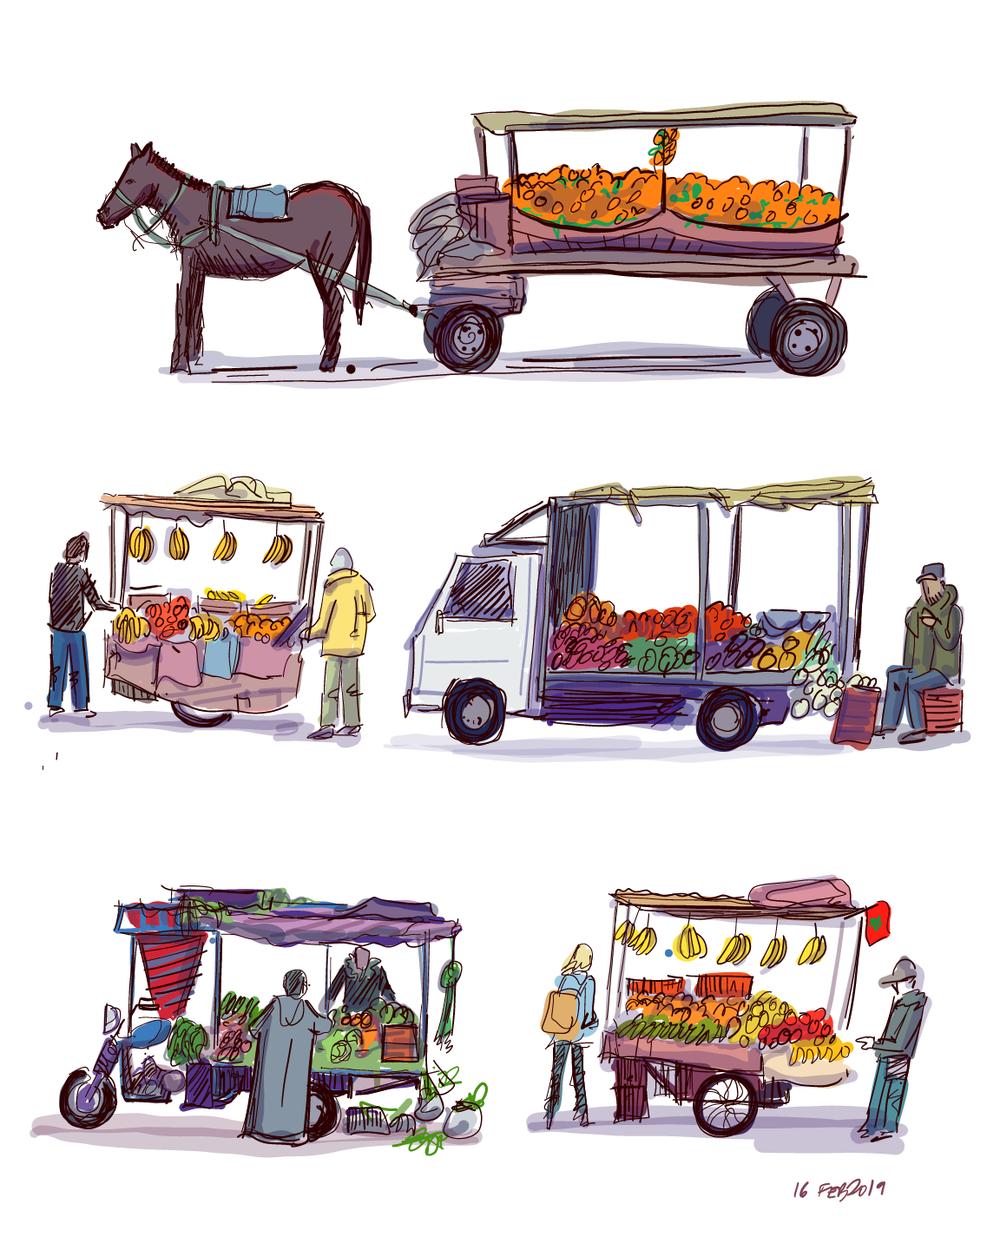 Fruit carts in Marrakech, Morocco